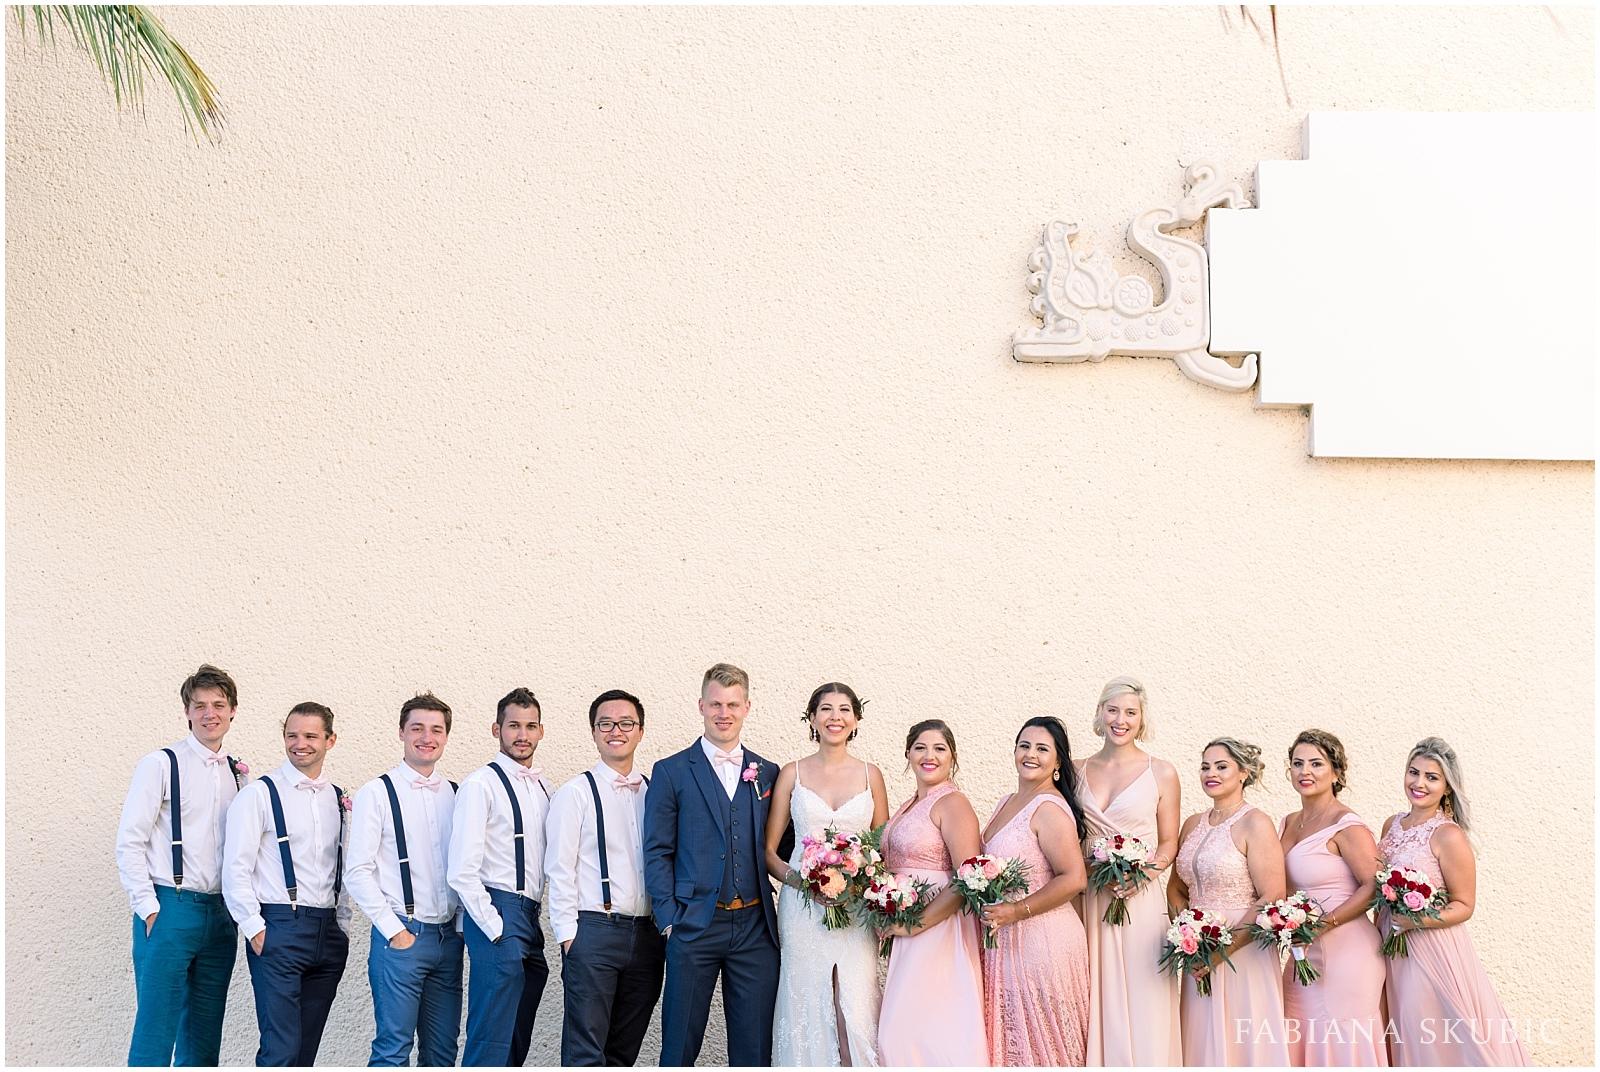 TJ_Now_Sapphire_Riviera_Cancun_Mexico_Wedding_Photos_0215.jpg